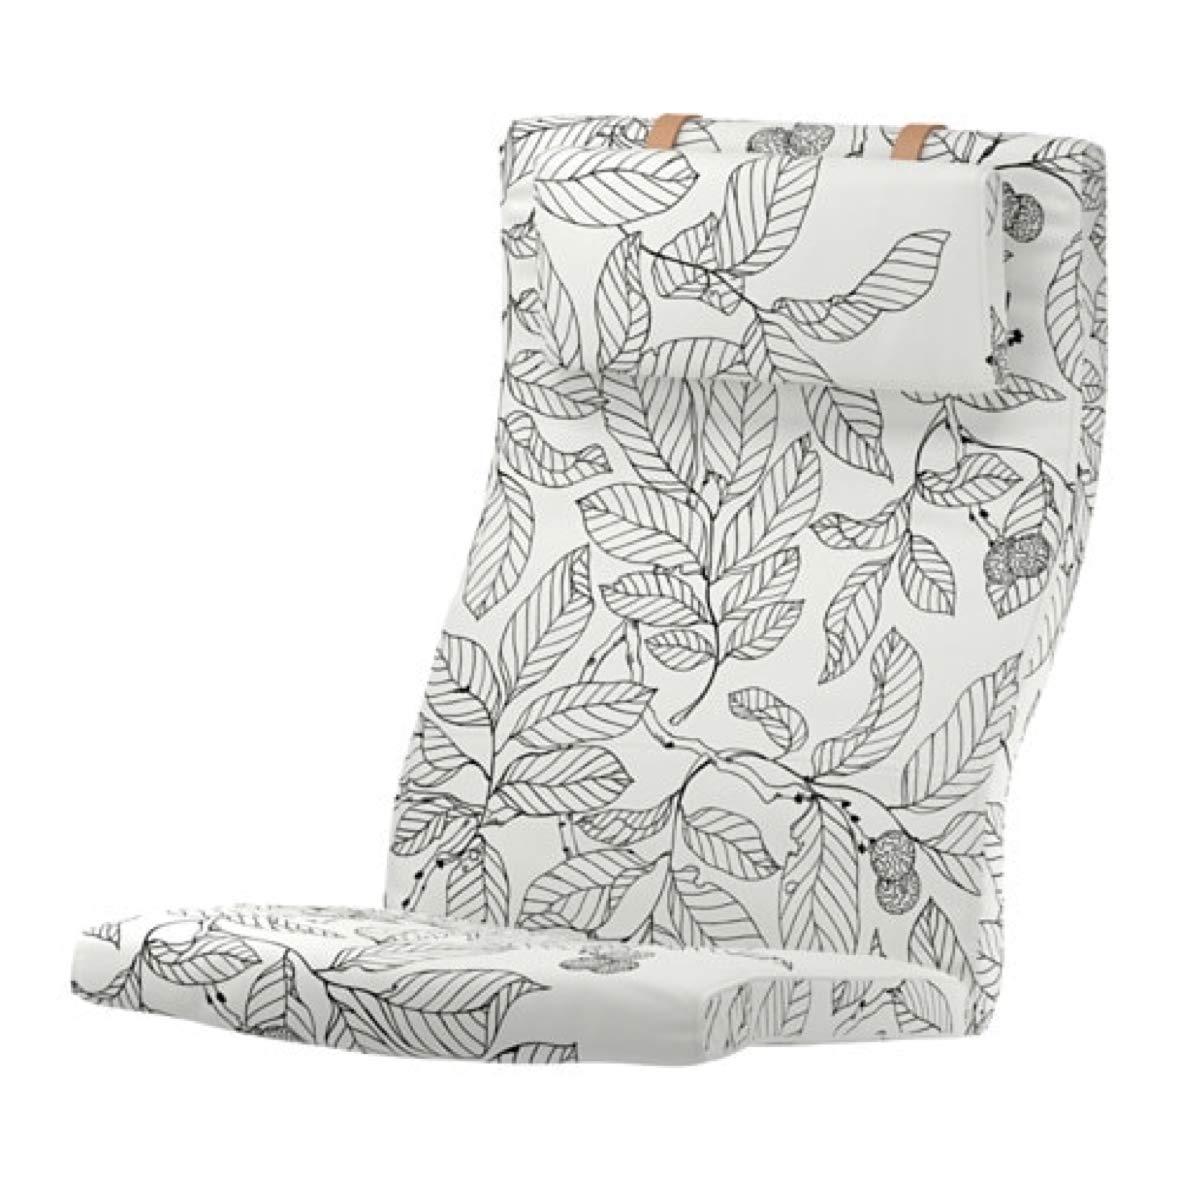 IKEA Poang 椅子クッション Vislanda 上等 ホワイト 休み ブラック 103.466.90 B07MWVKGJX